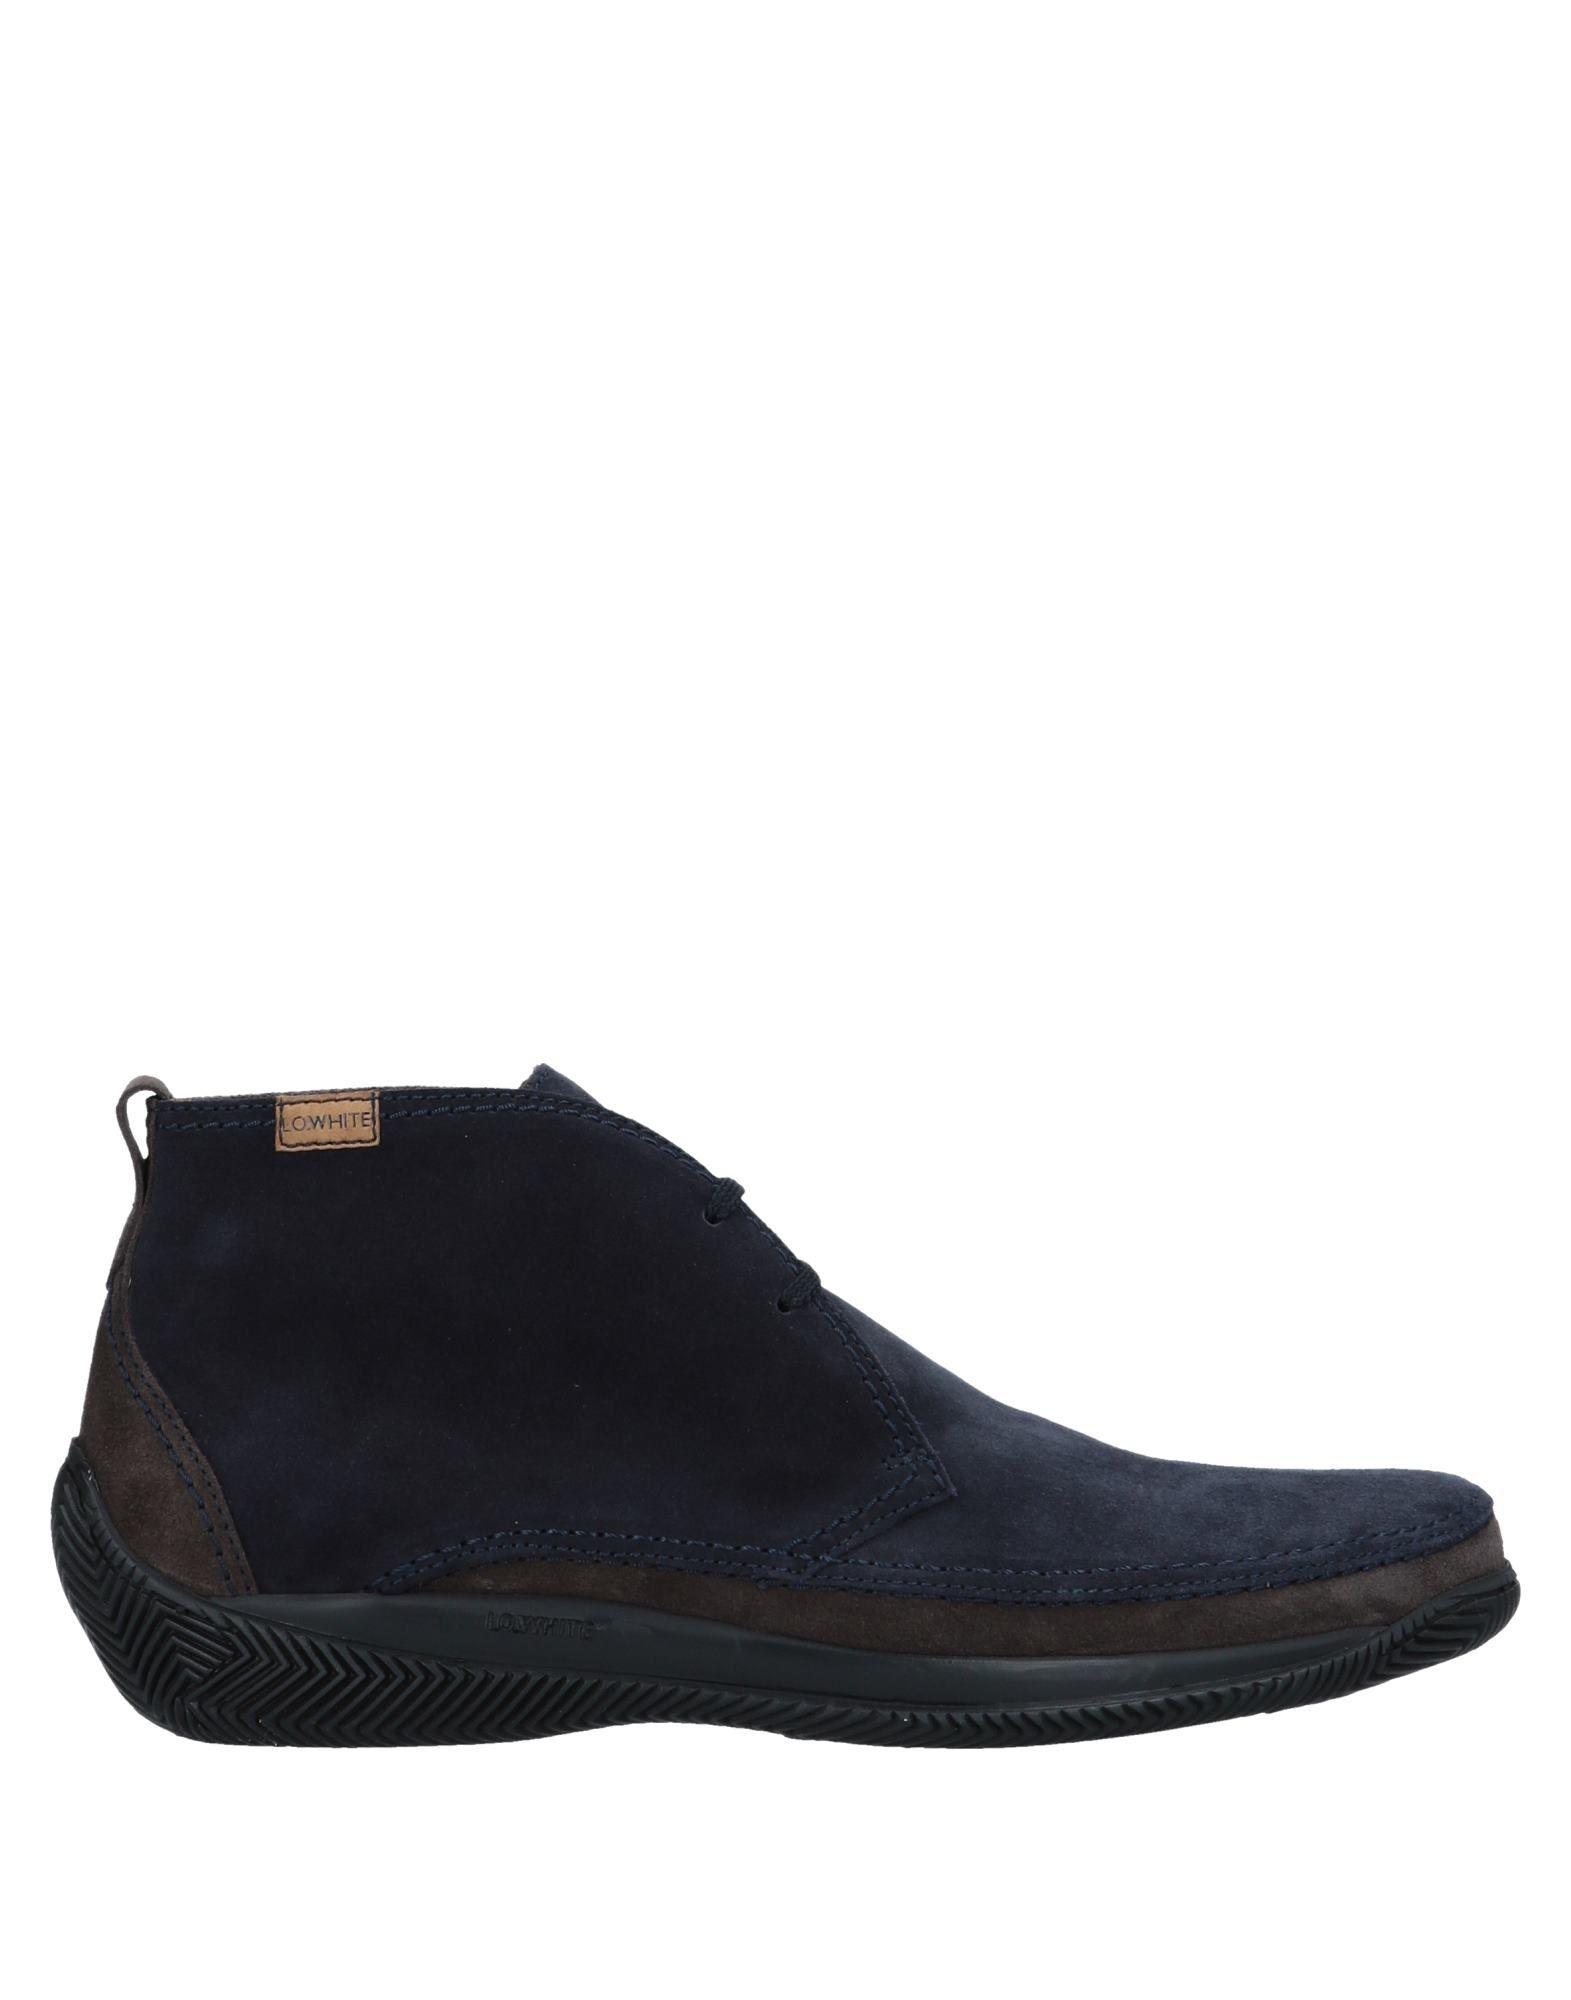 Lo.White Boots - Men  Lo.White Boots online on  Men Australia - 11538192TK 198f1f